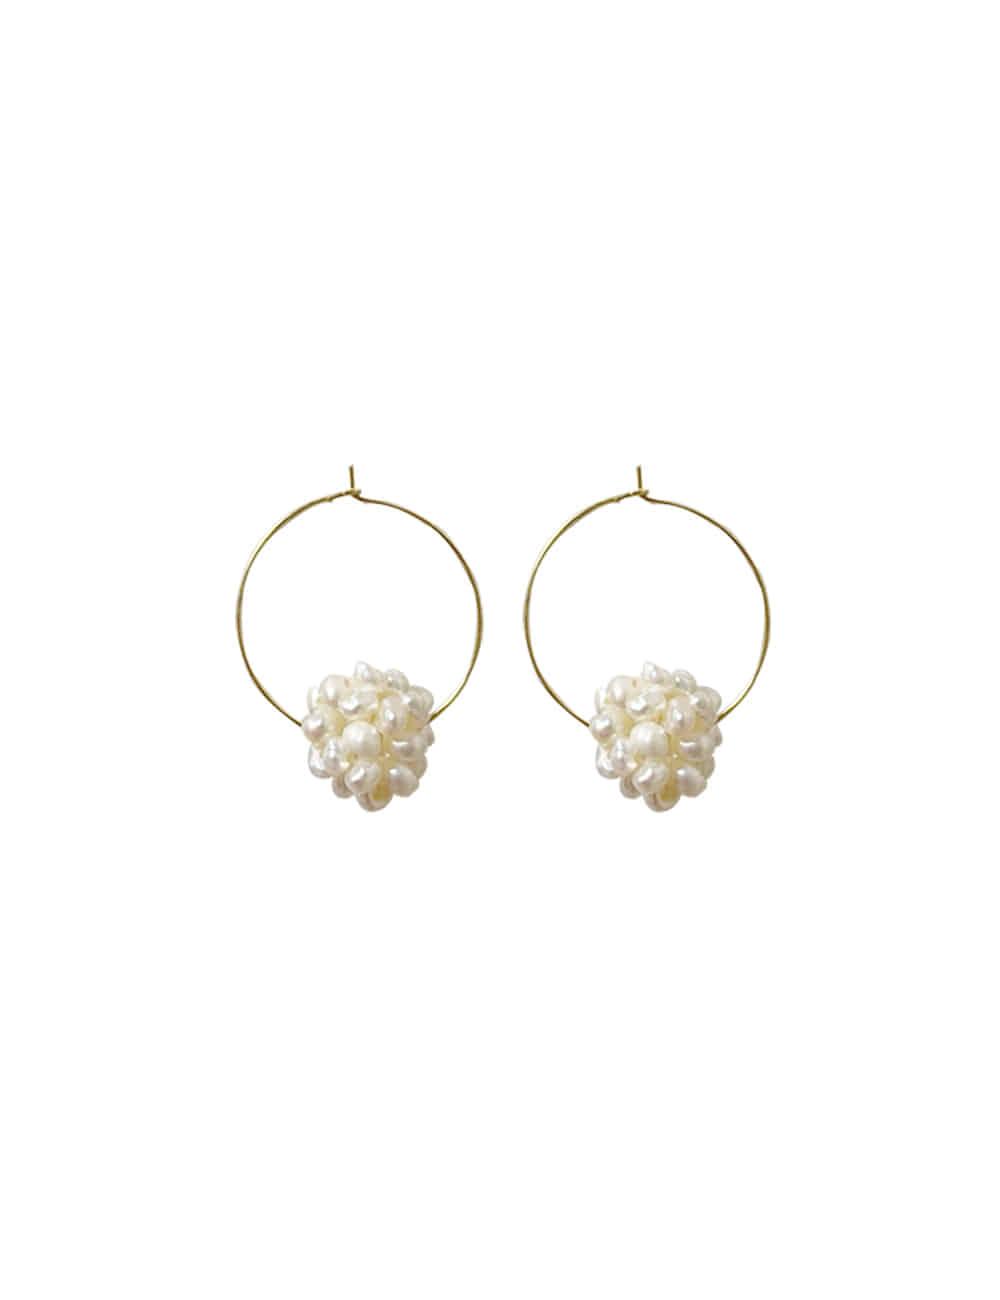 925 Silver Ball Nature Pearl Earrings _ 담수진주 볼 링귀걸이 라비쉬에